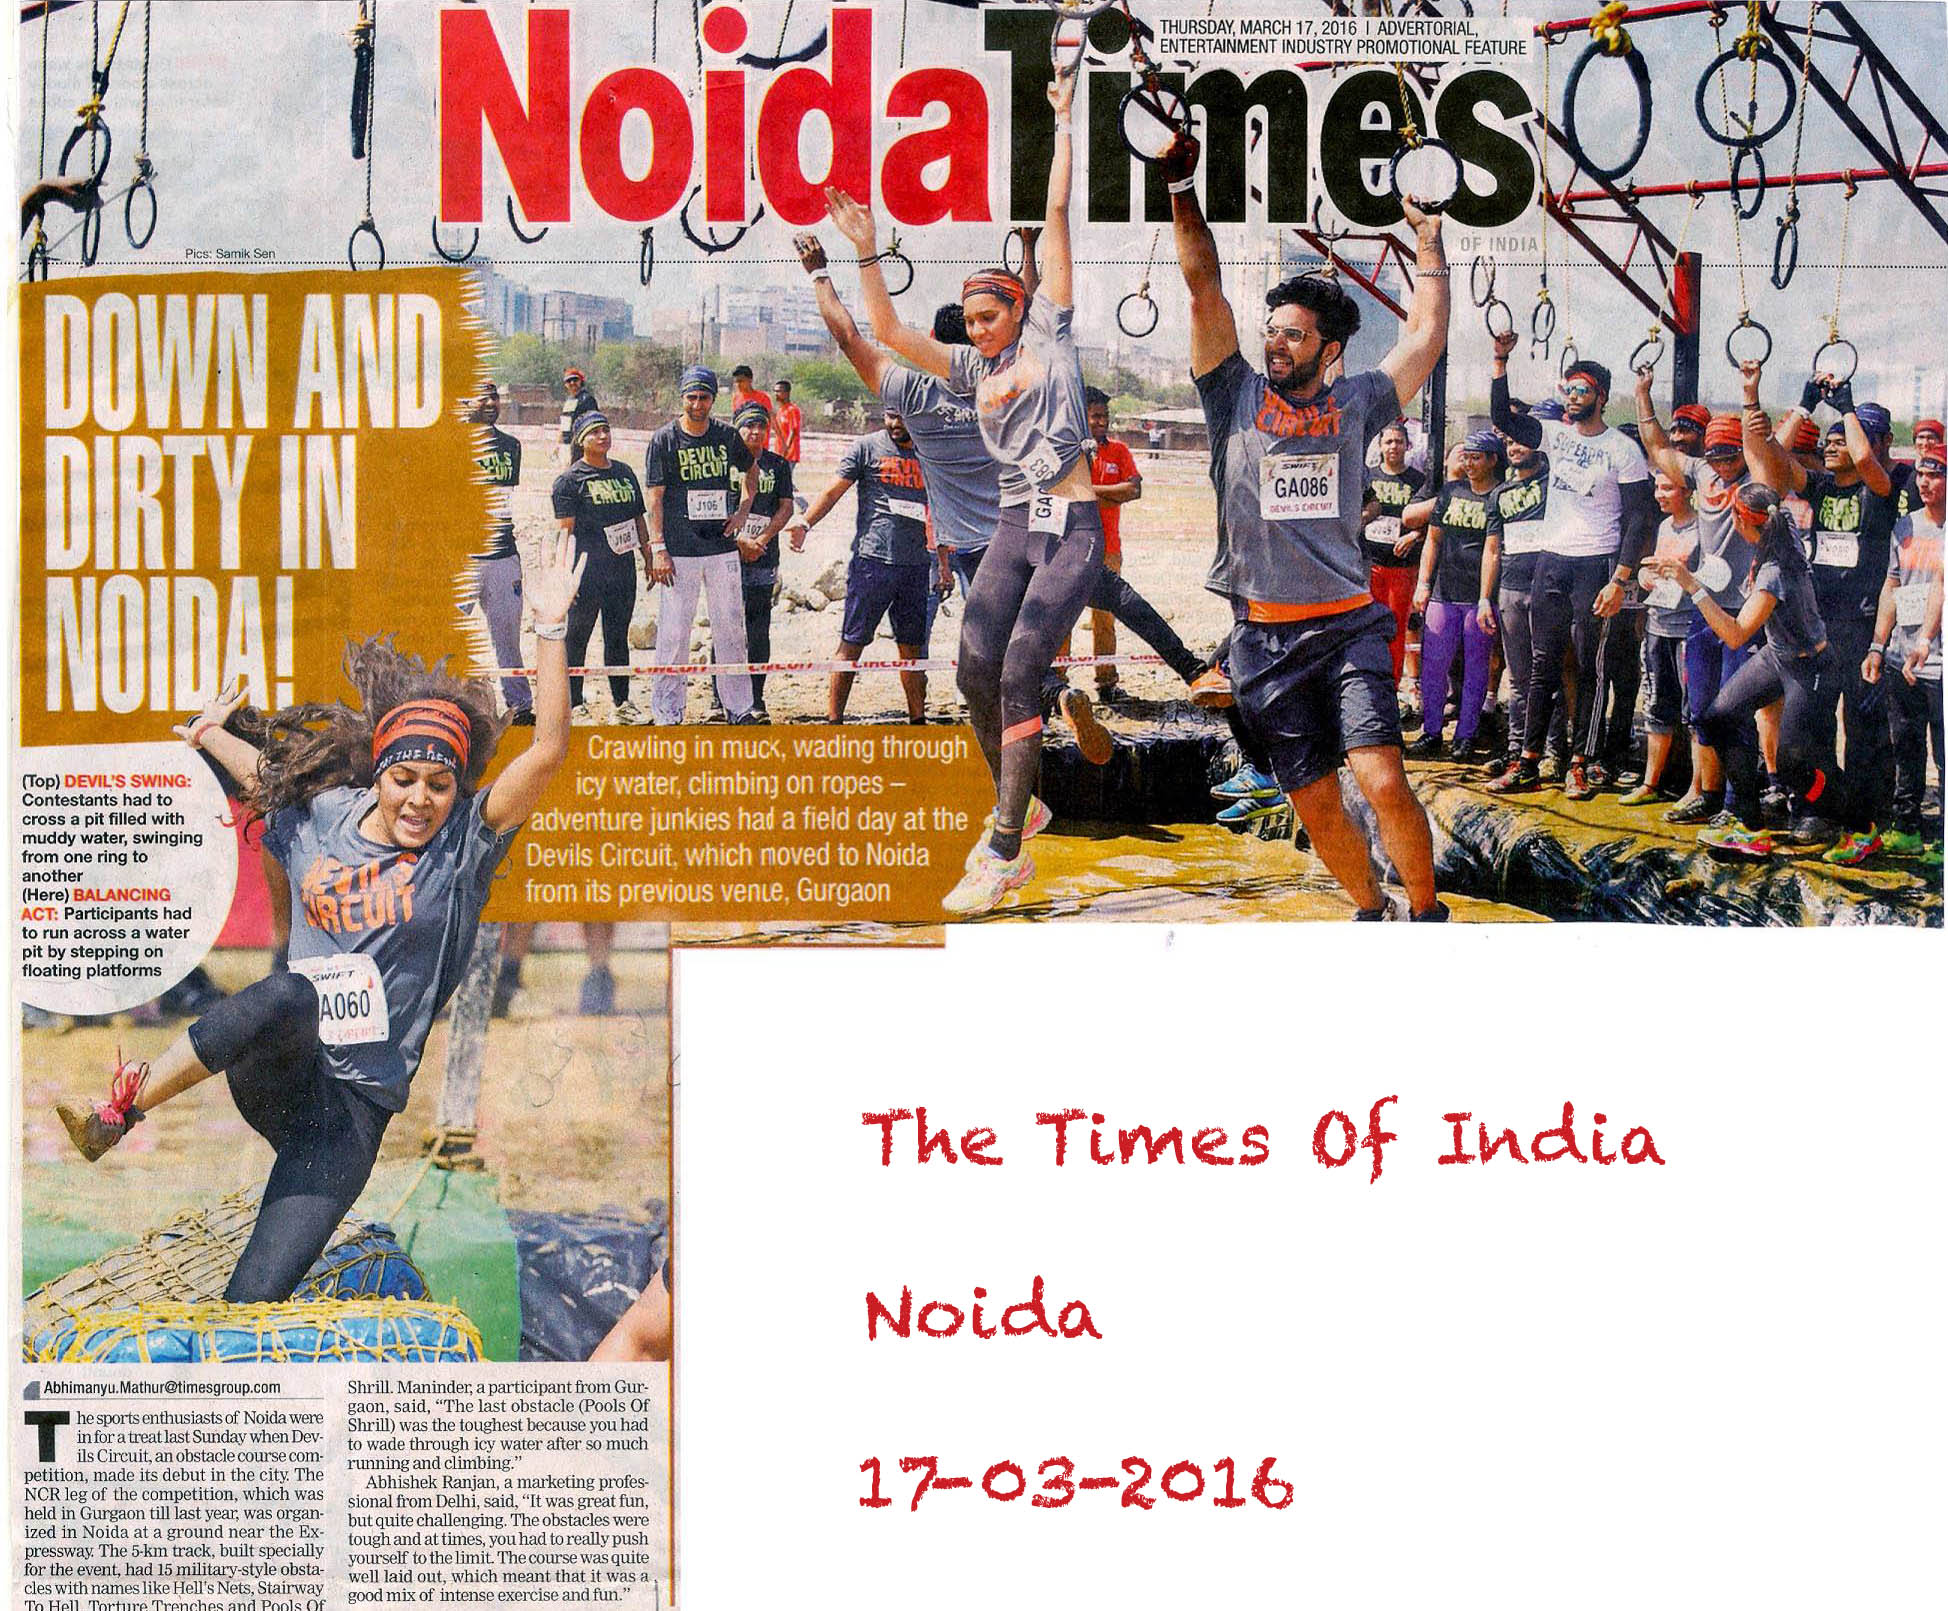 times-of-india-noida-17032016a